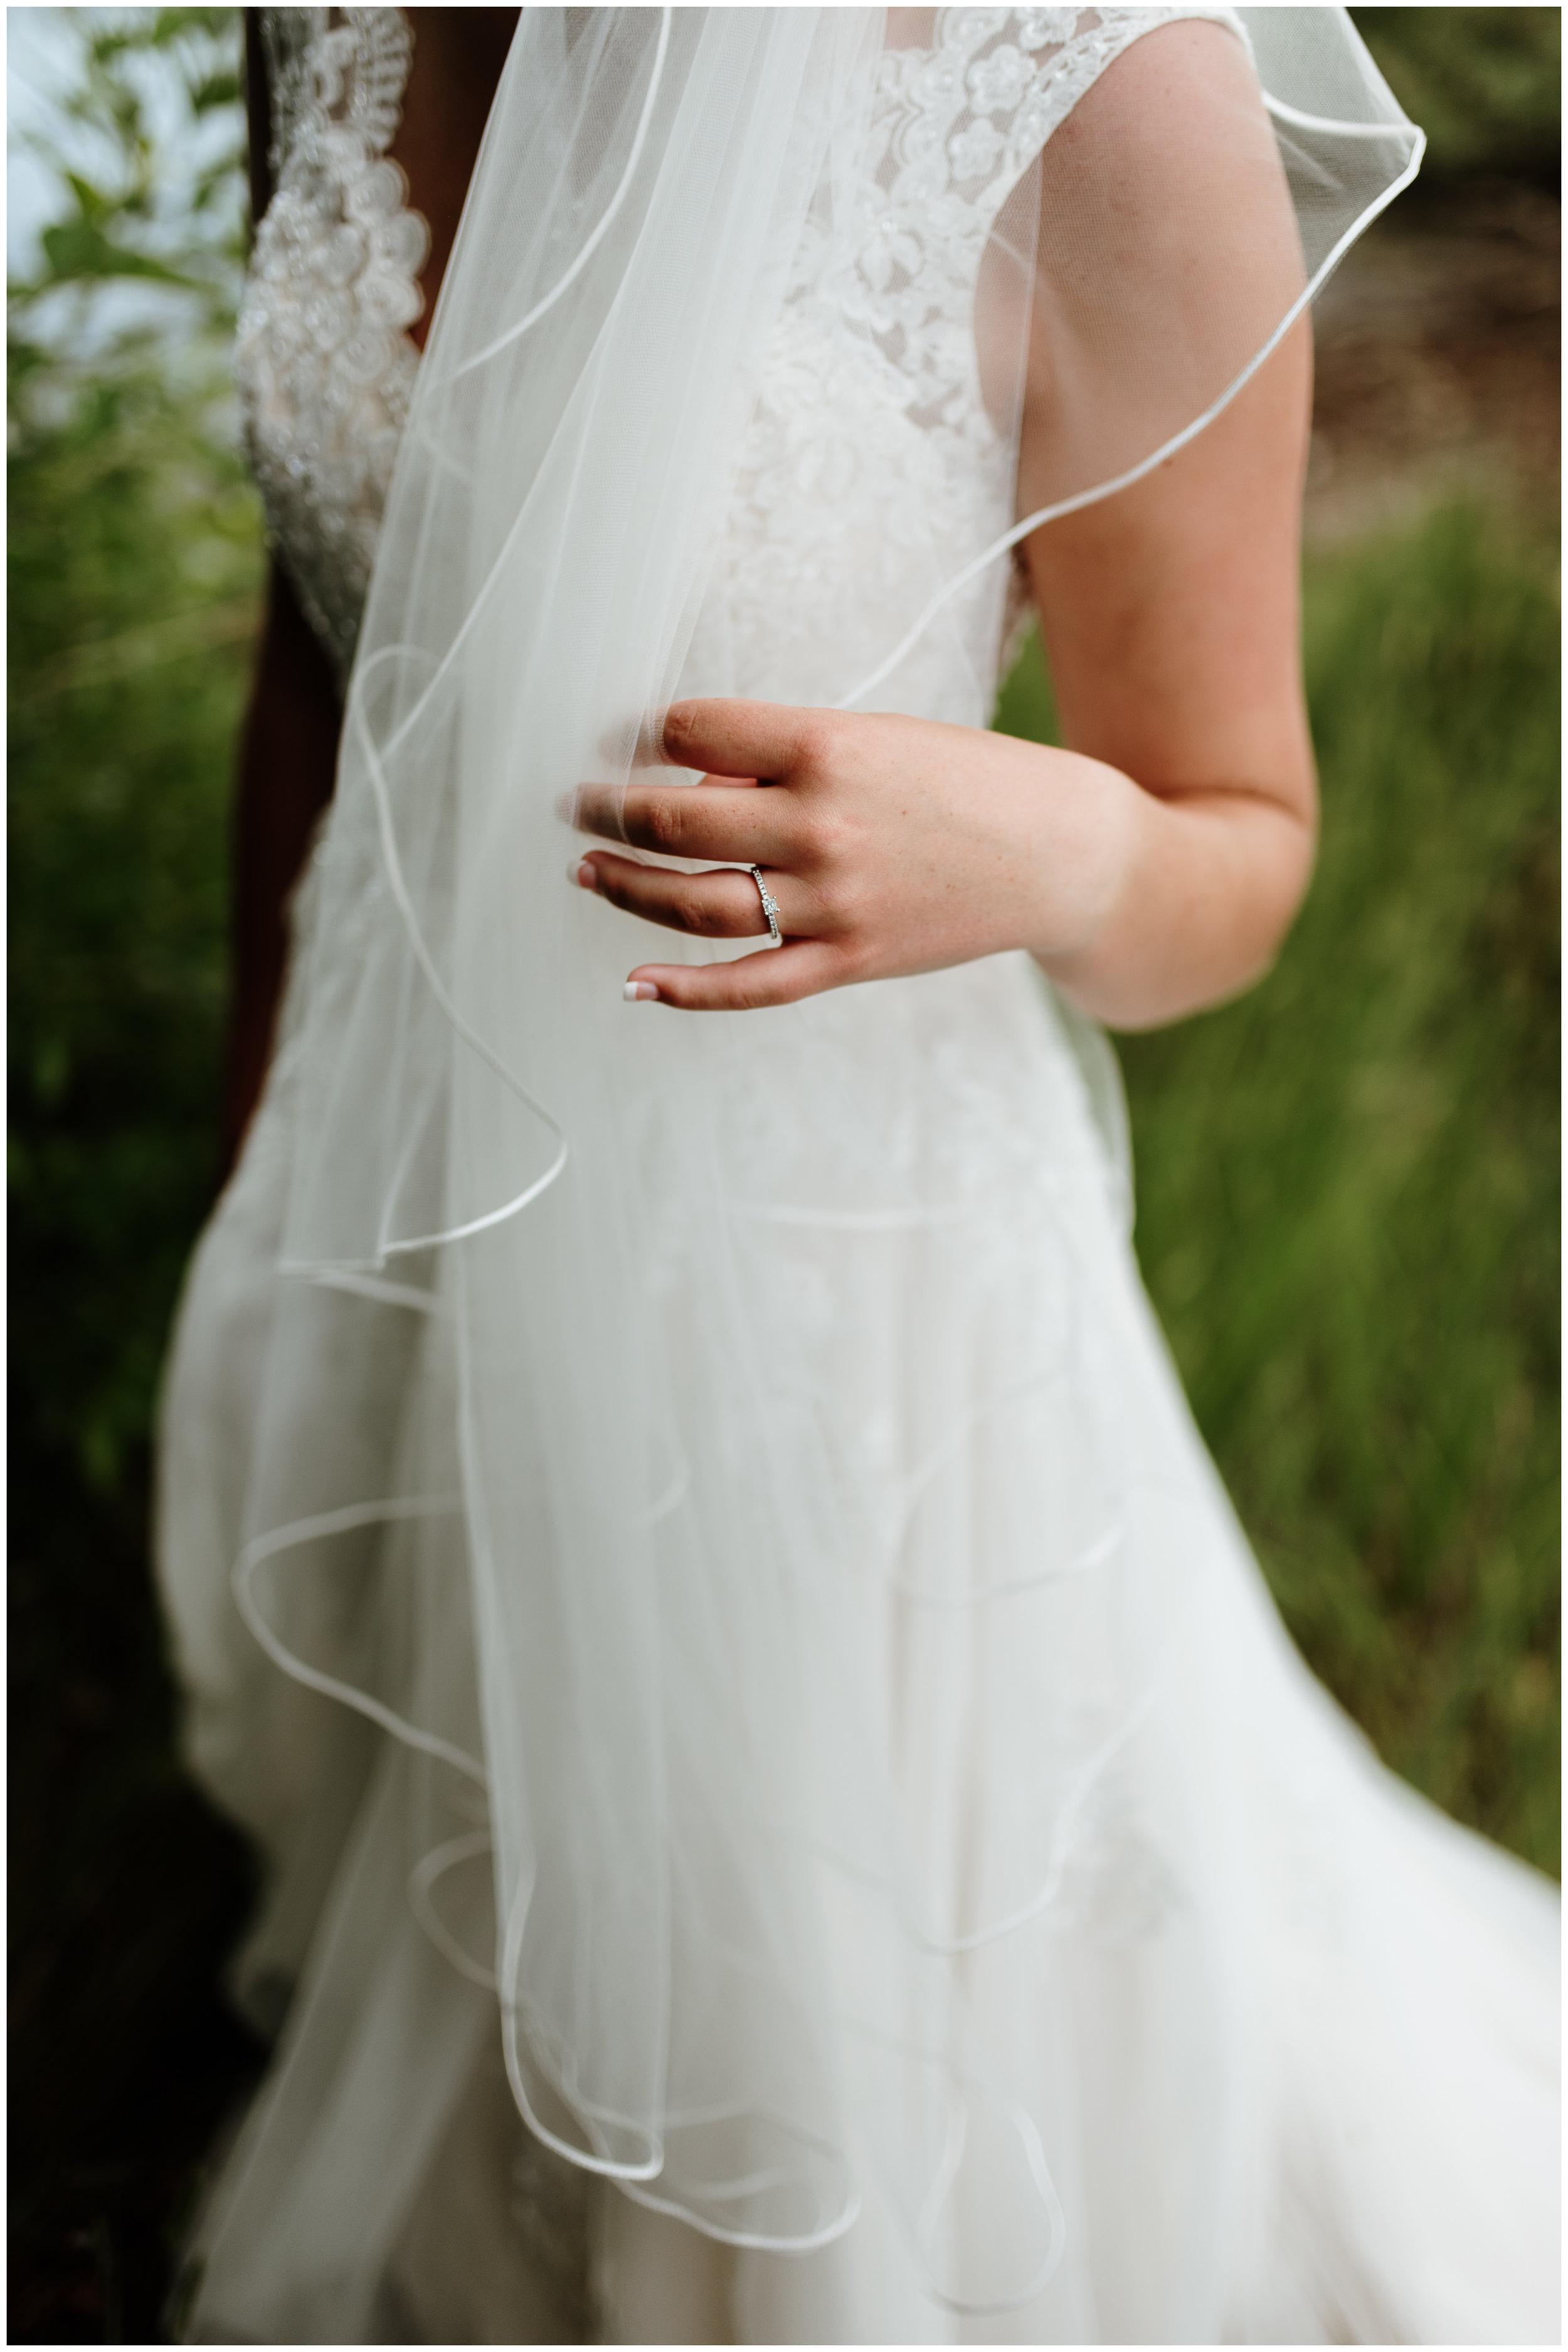 malia_clint_valier_rural_wedding_p19.jpg